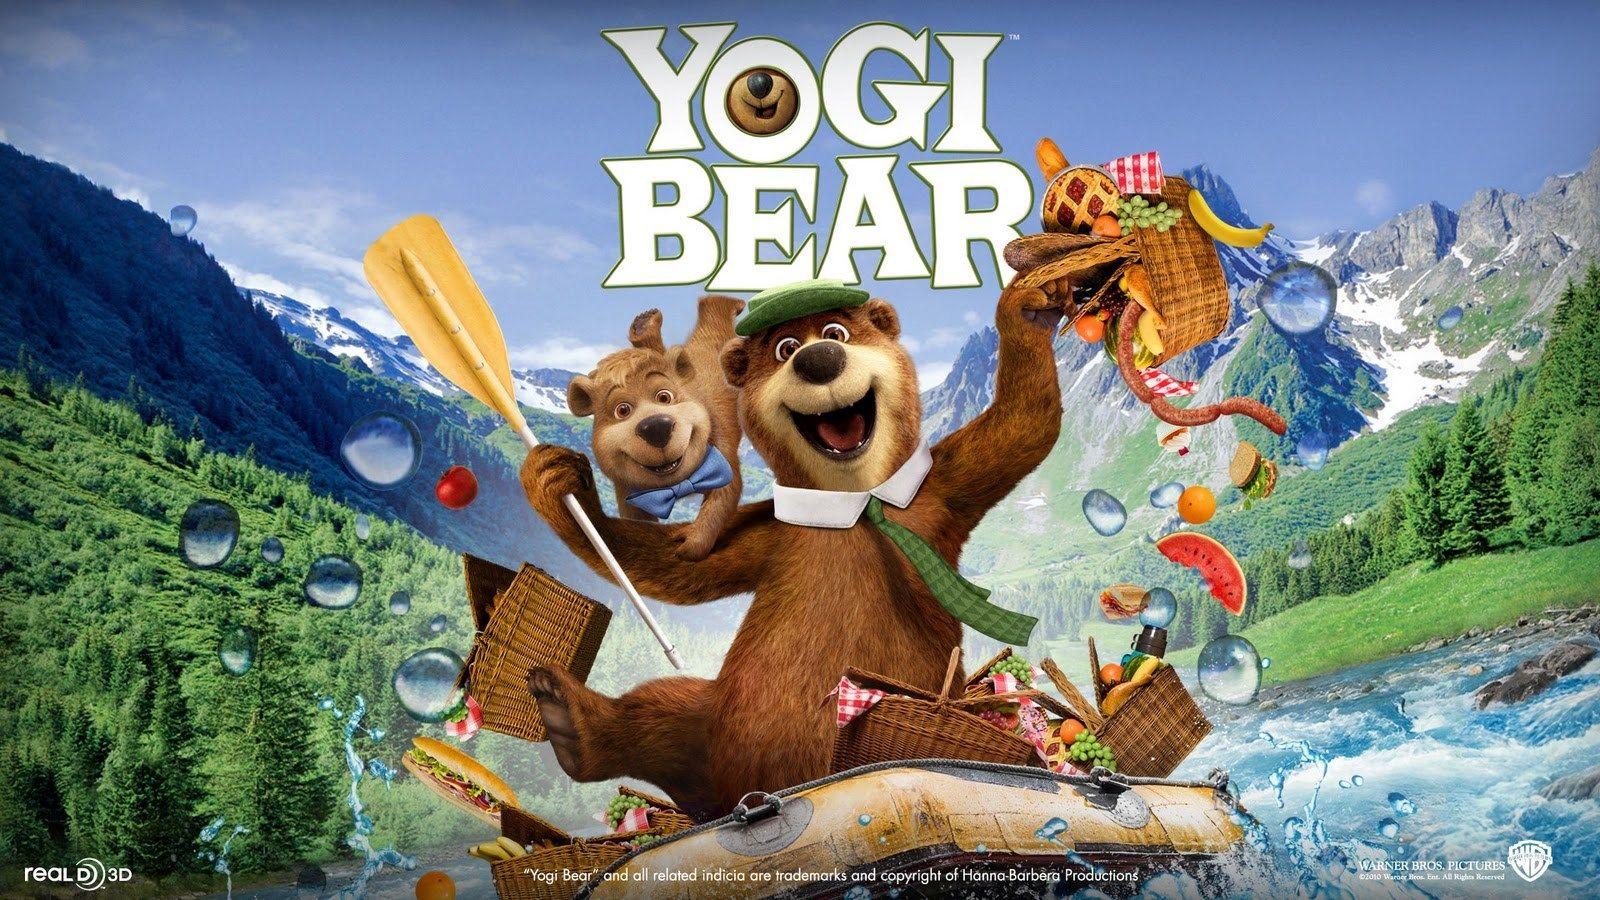 1600x900 High Resolution Wallpaper Yogi Bear Movie Wallpapers